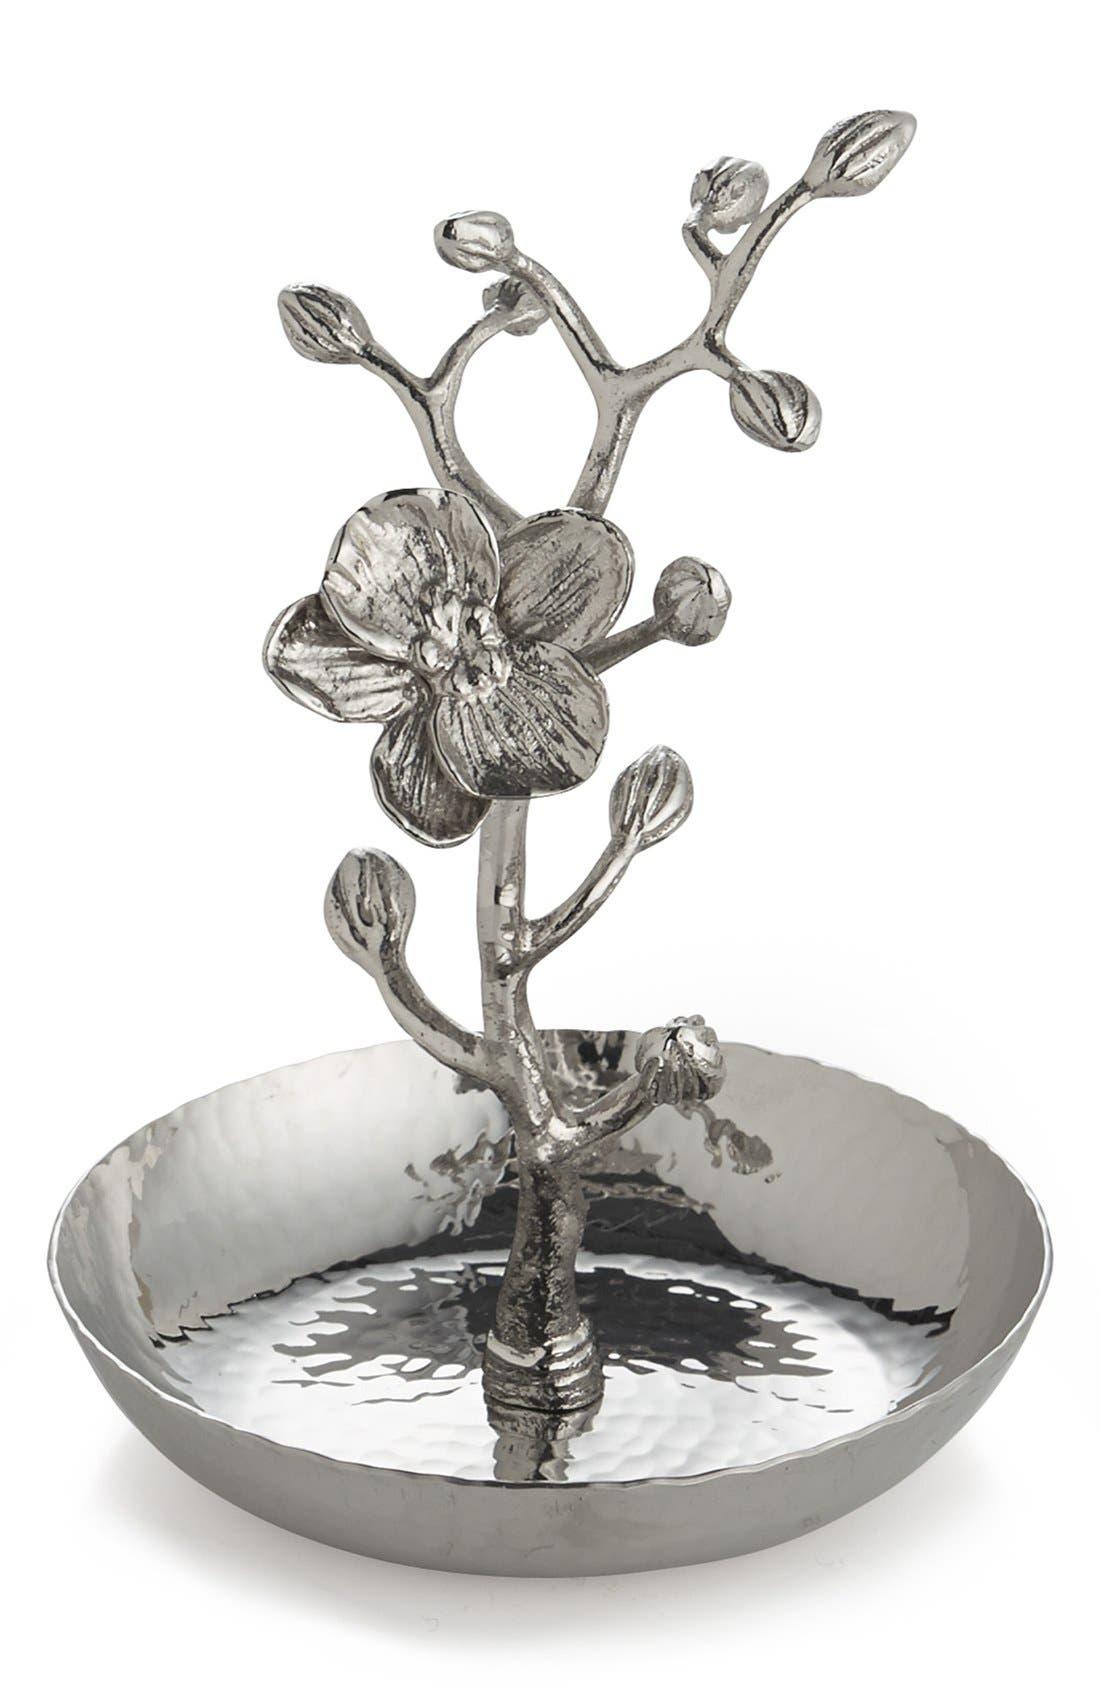 Michael Aram 'White Orchid' Ring Catch